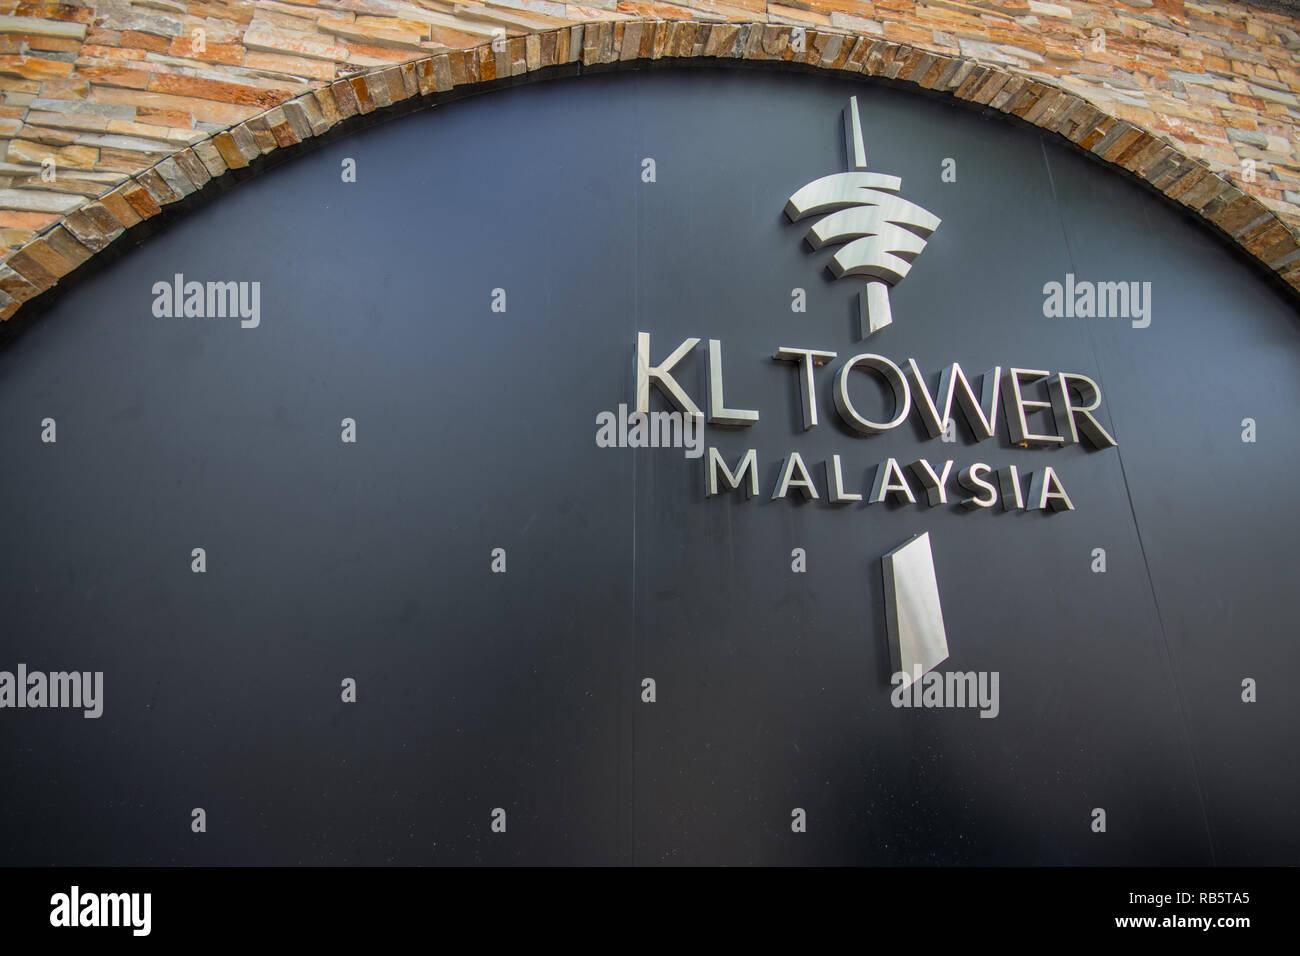 Entrance sign at KL Tower, Bukit Nanas, Kuala Lumpur, Malaysia - Stock Image